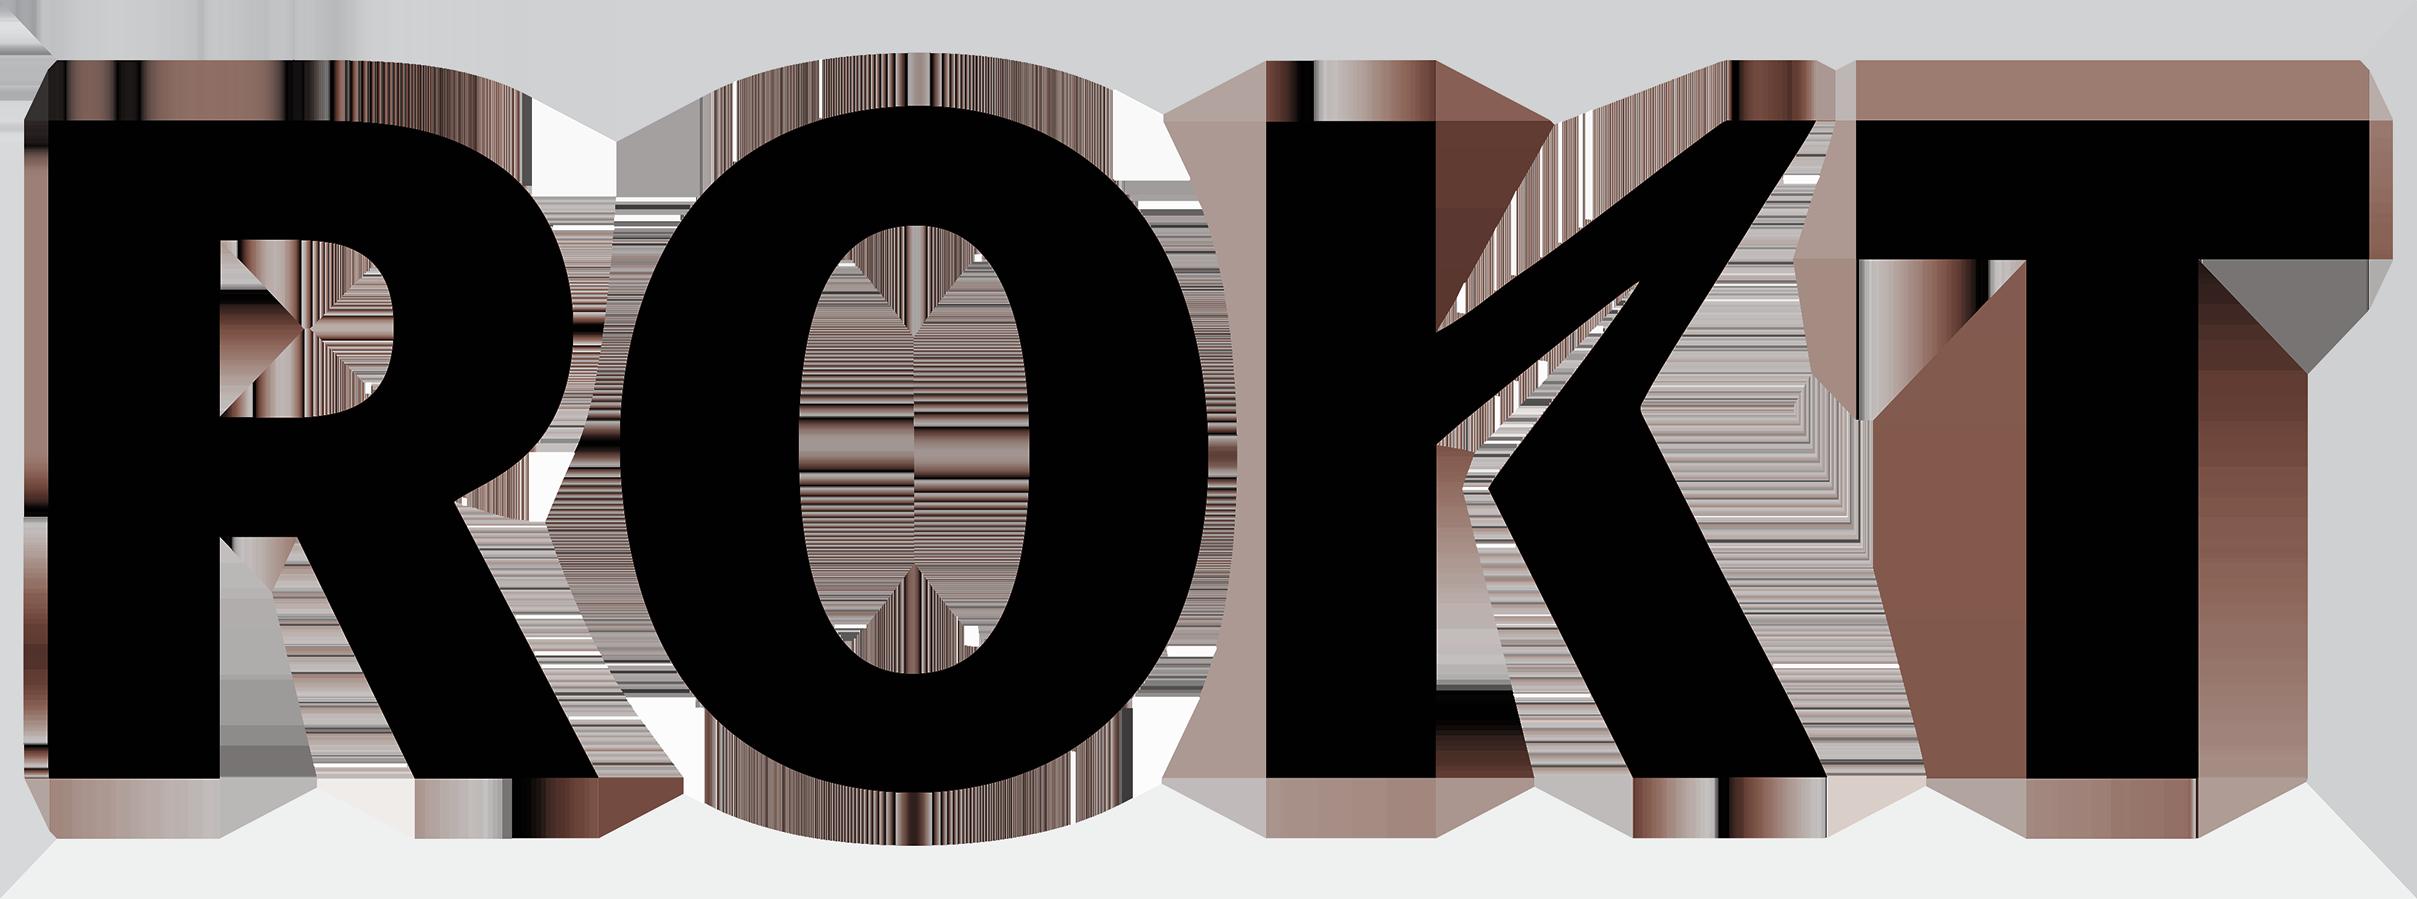 Rokt Owler 20171219 171644 Original